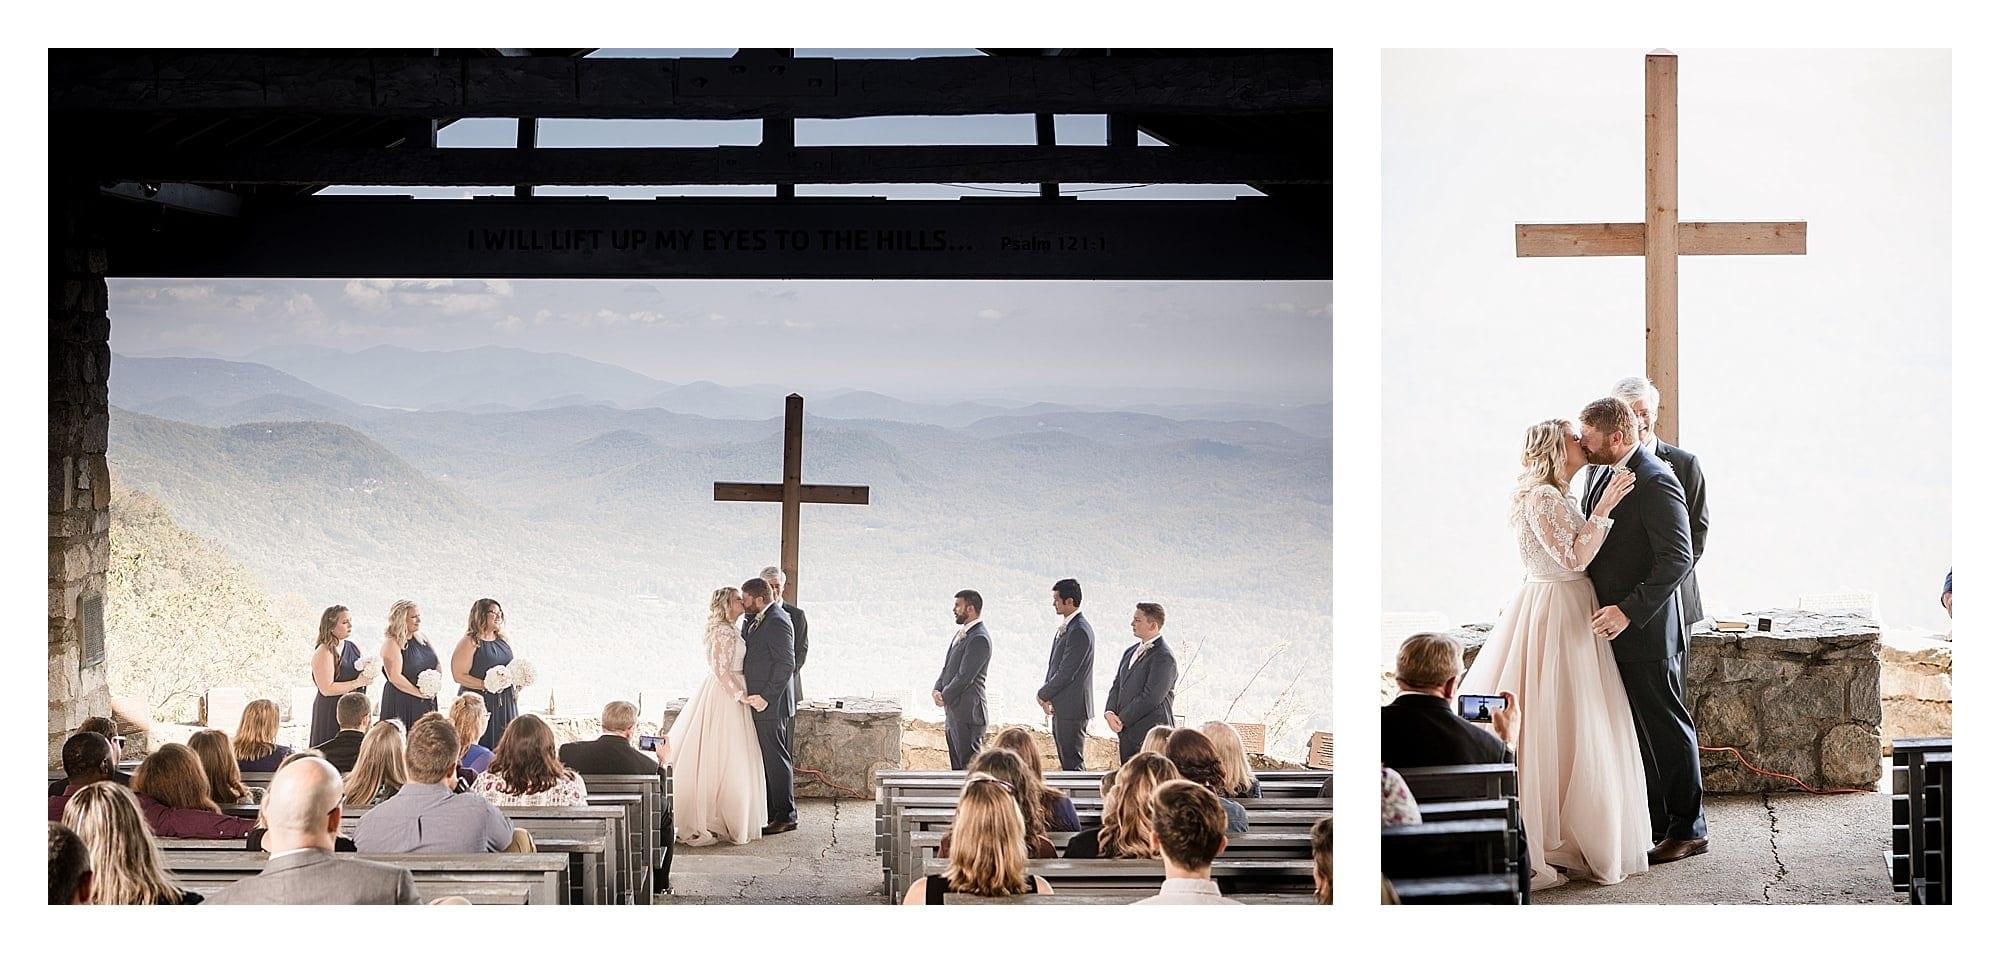 Mountain view wedding ceremony Ashevill